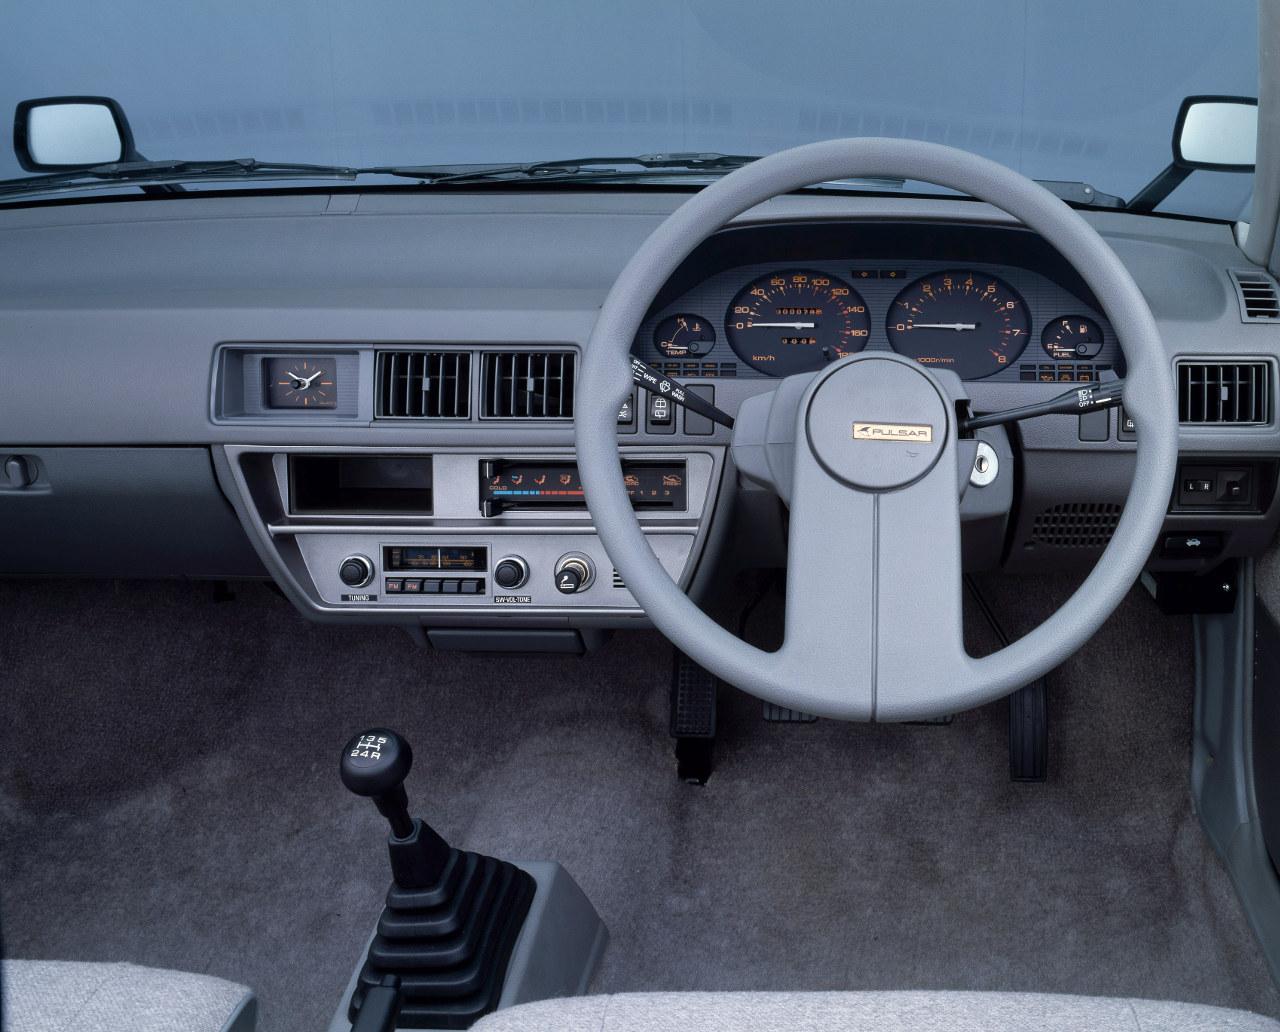 [Image: Nissan%2BPulsar%2B82.jpeg]